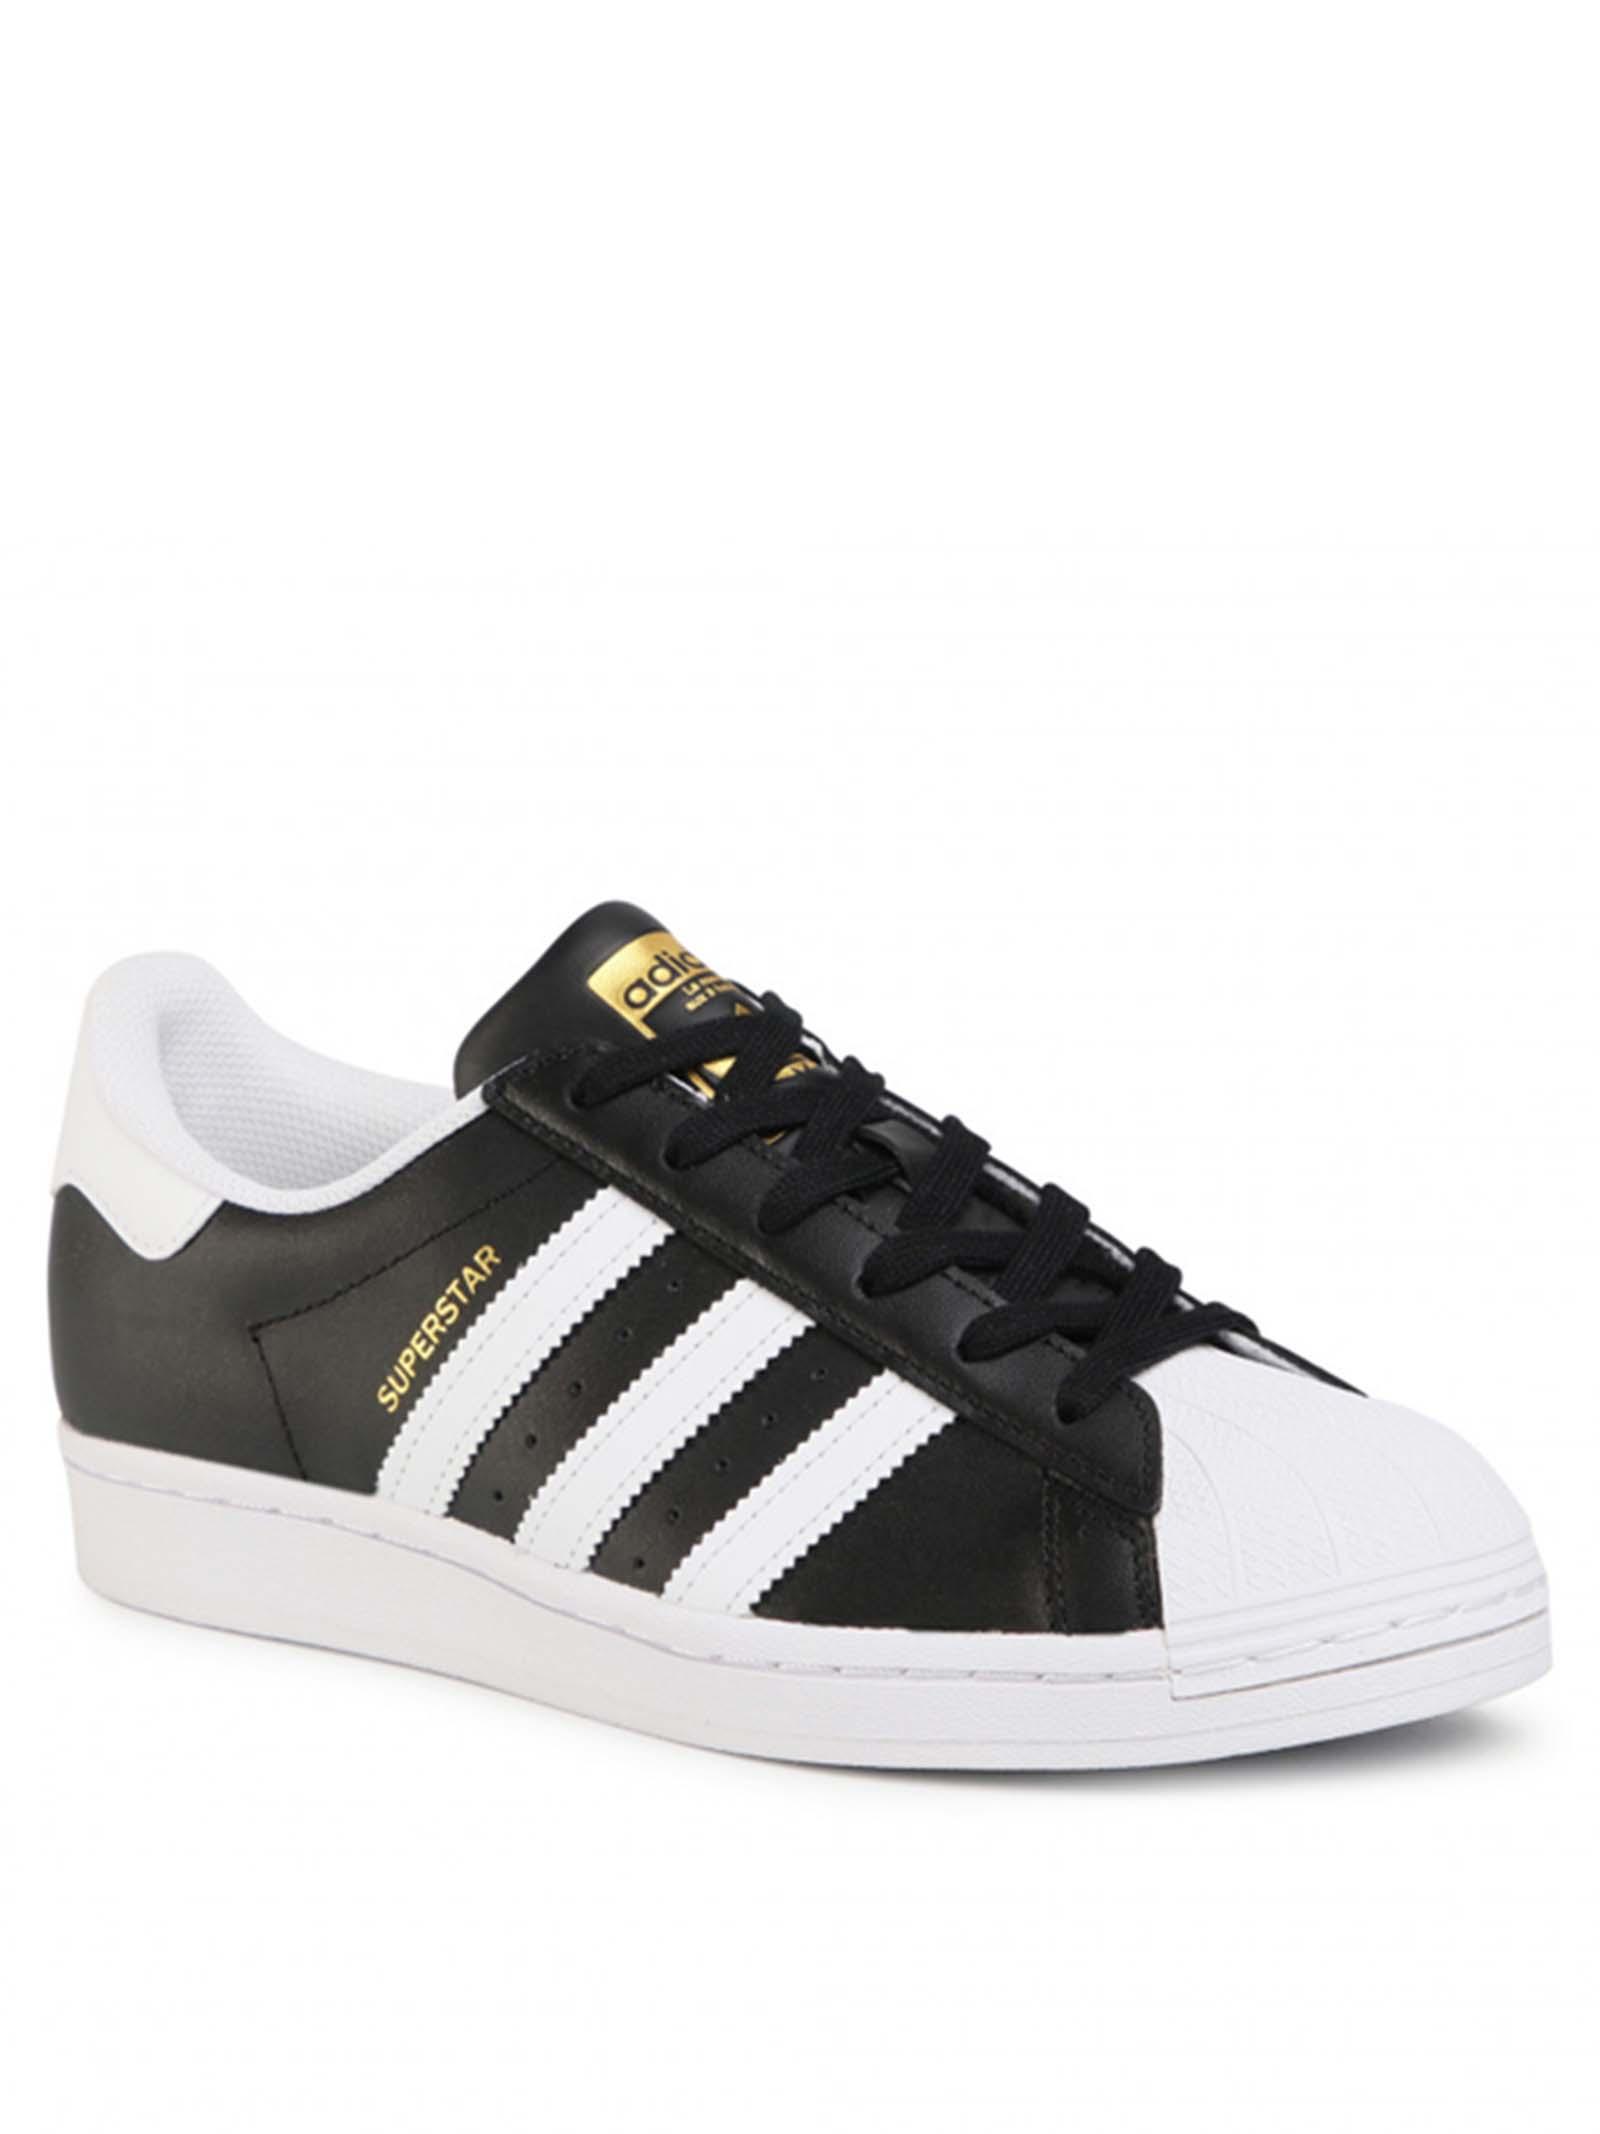 Calzature Uomo Sneakers Superstar Vegan in Ecopelle Nera e Bianca FW2296 Adidas | Sneakers | SUPERSTARFW2296